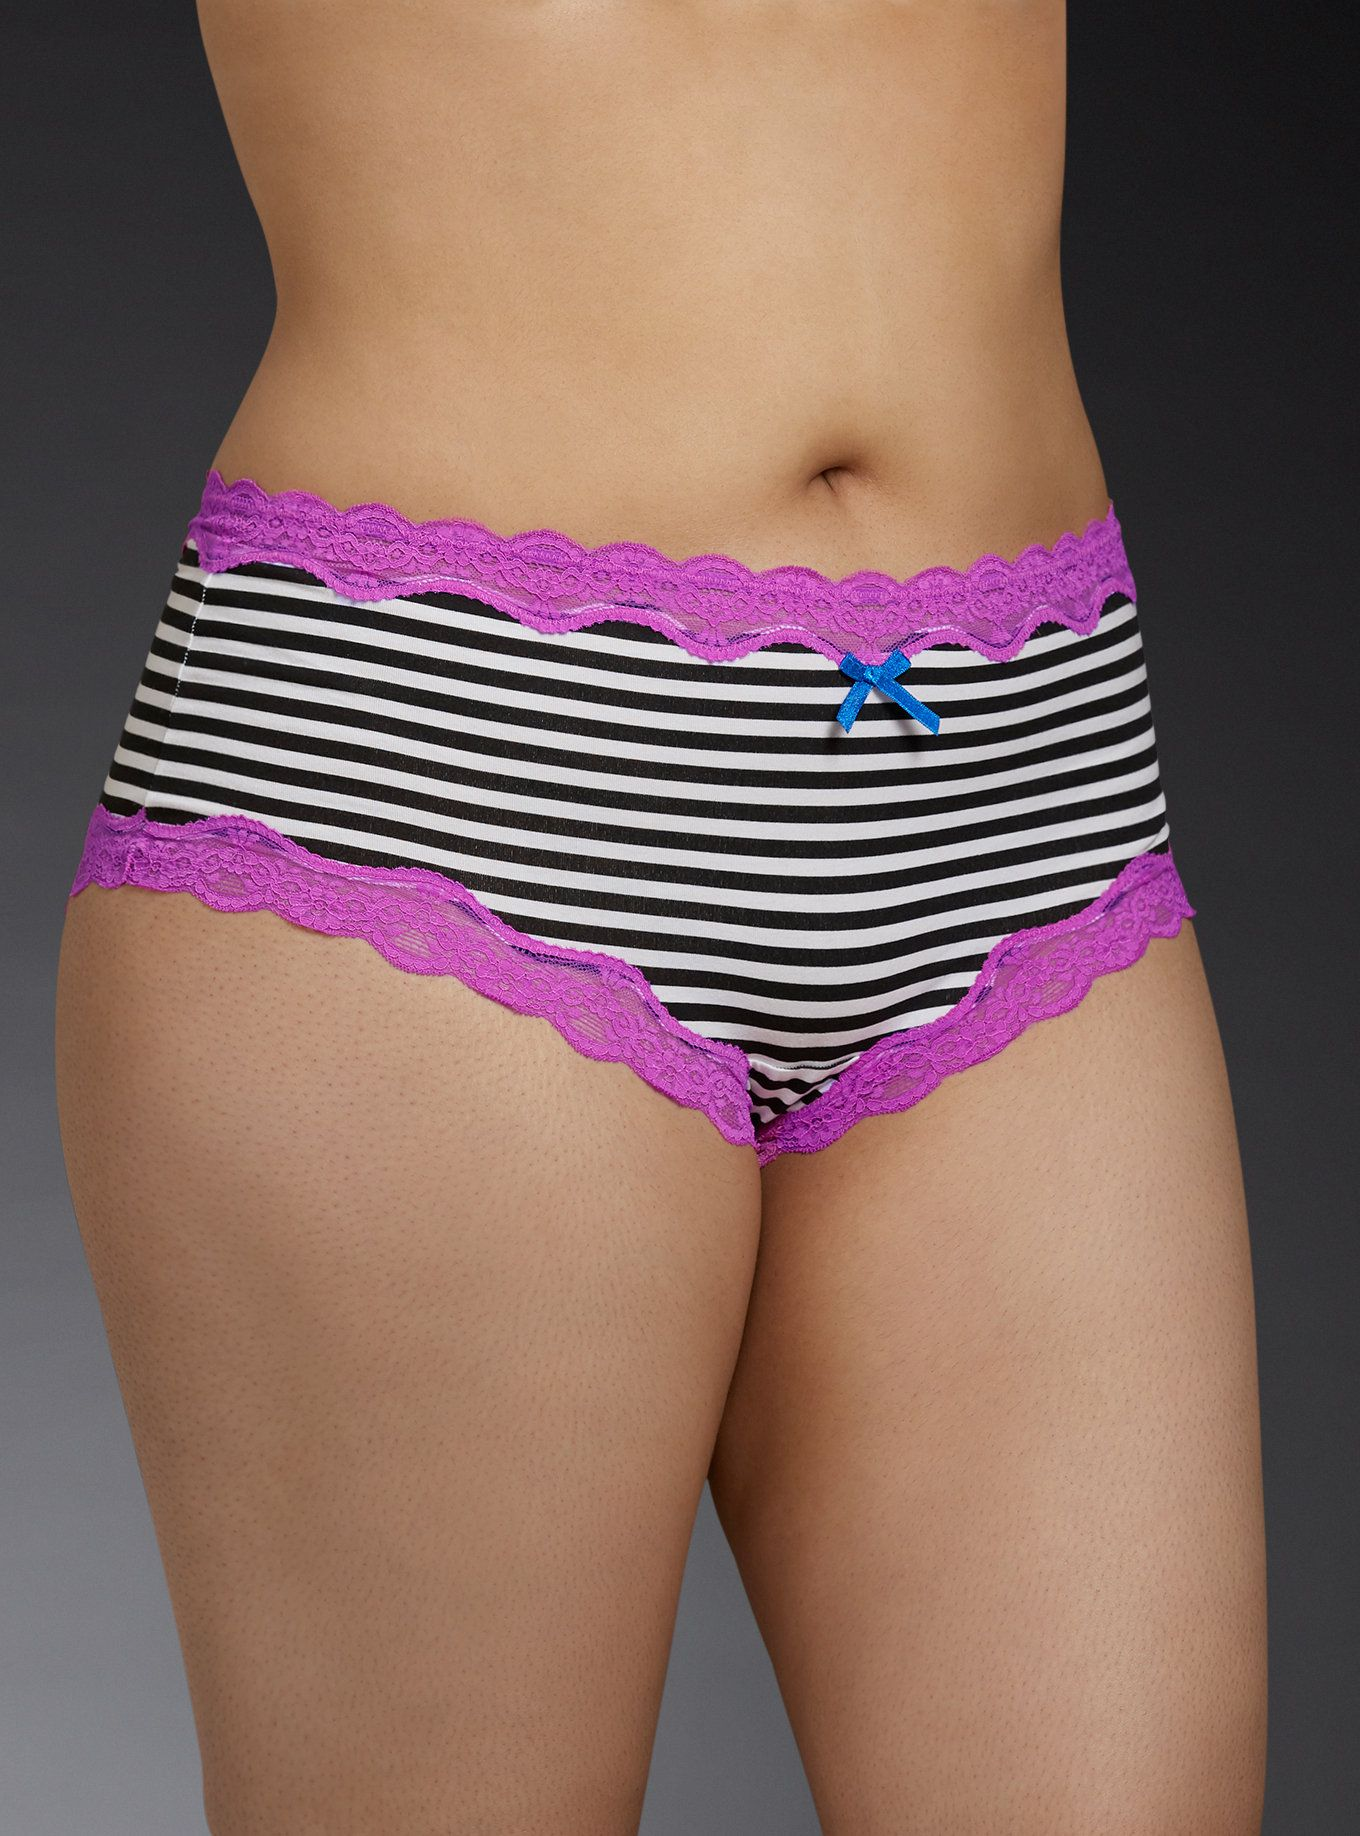 a1d2ac04c460 Striped Lace Trim Cheeky Panty | Torrid | Curvy Girl Lingerie That's ...